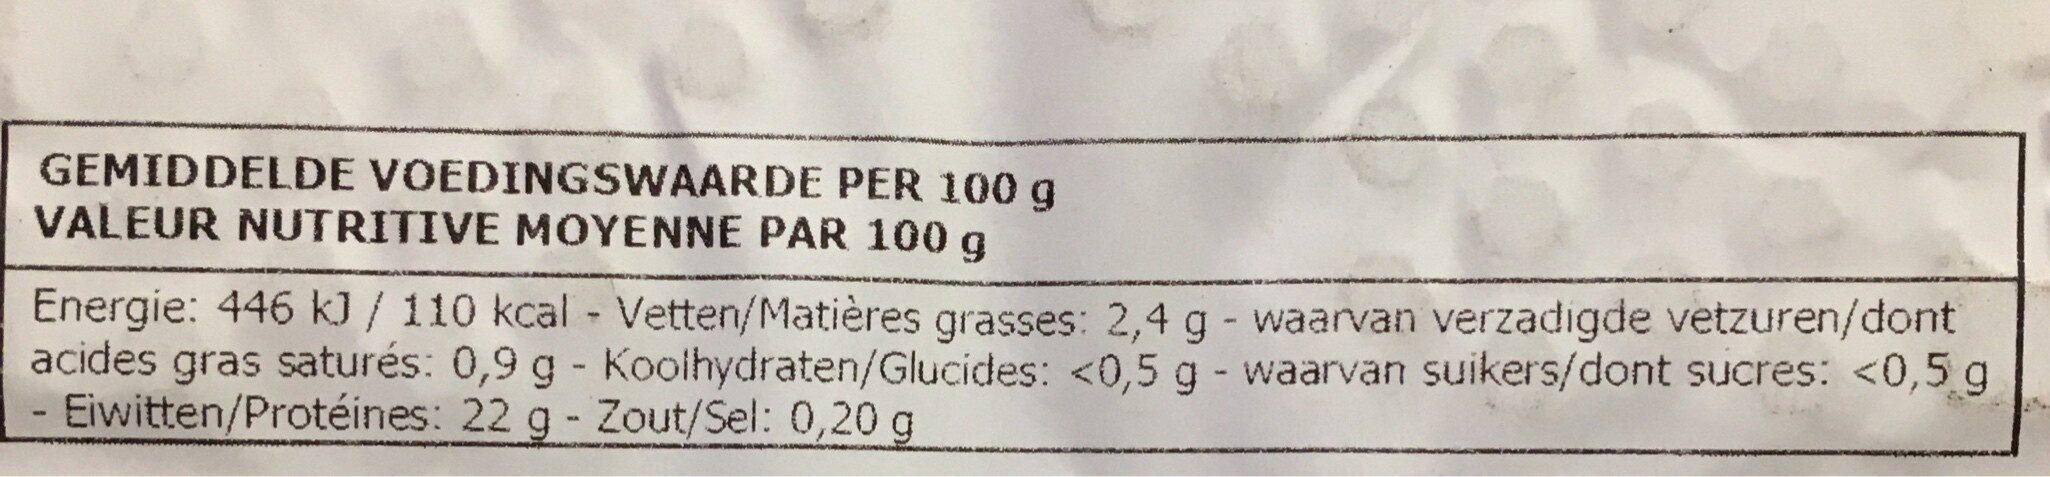 Filet de Poitrine - Ingrediënten